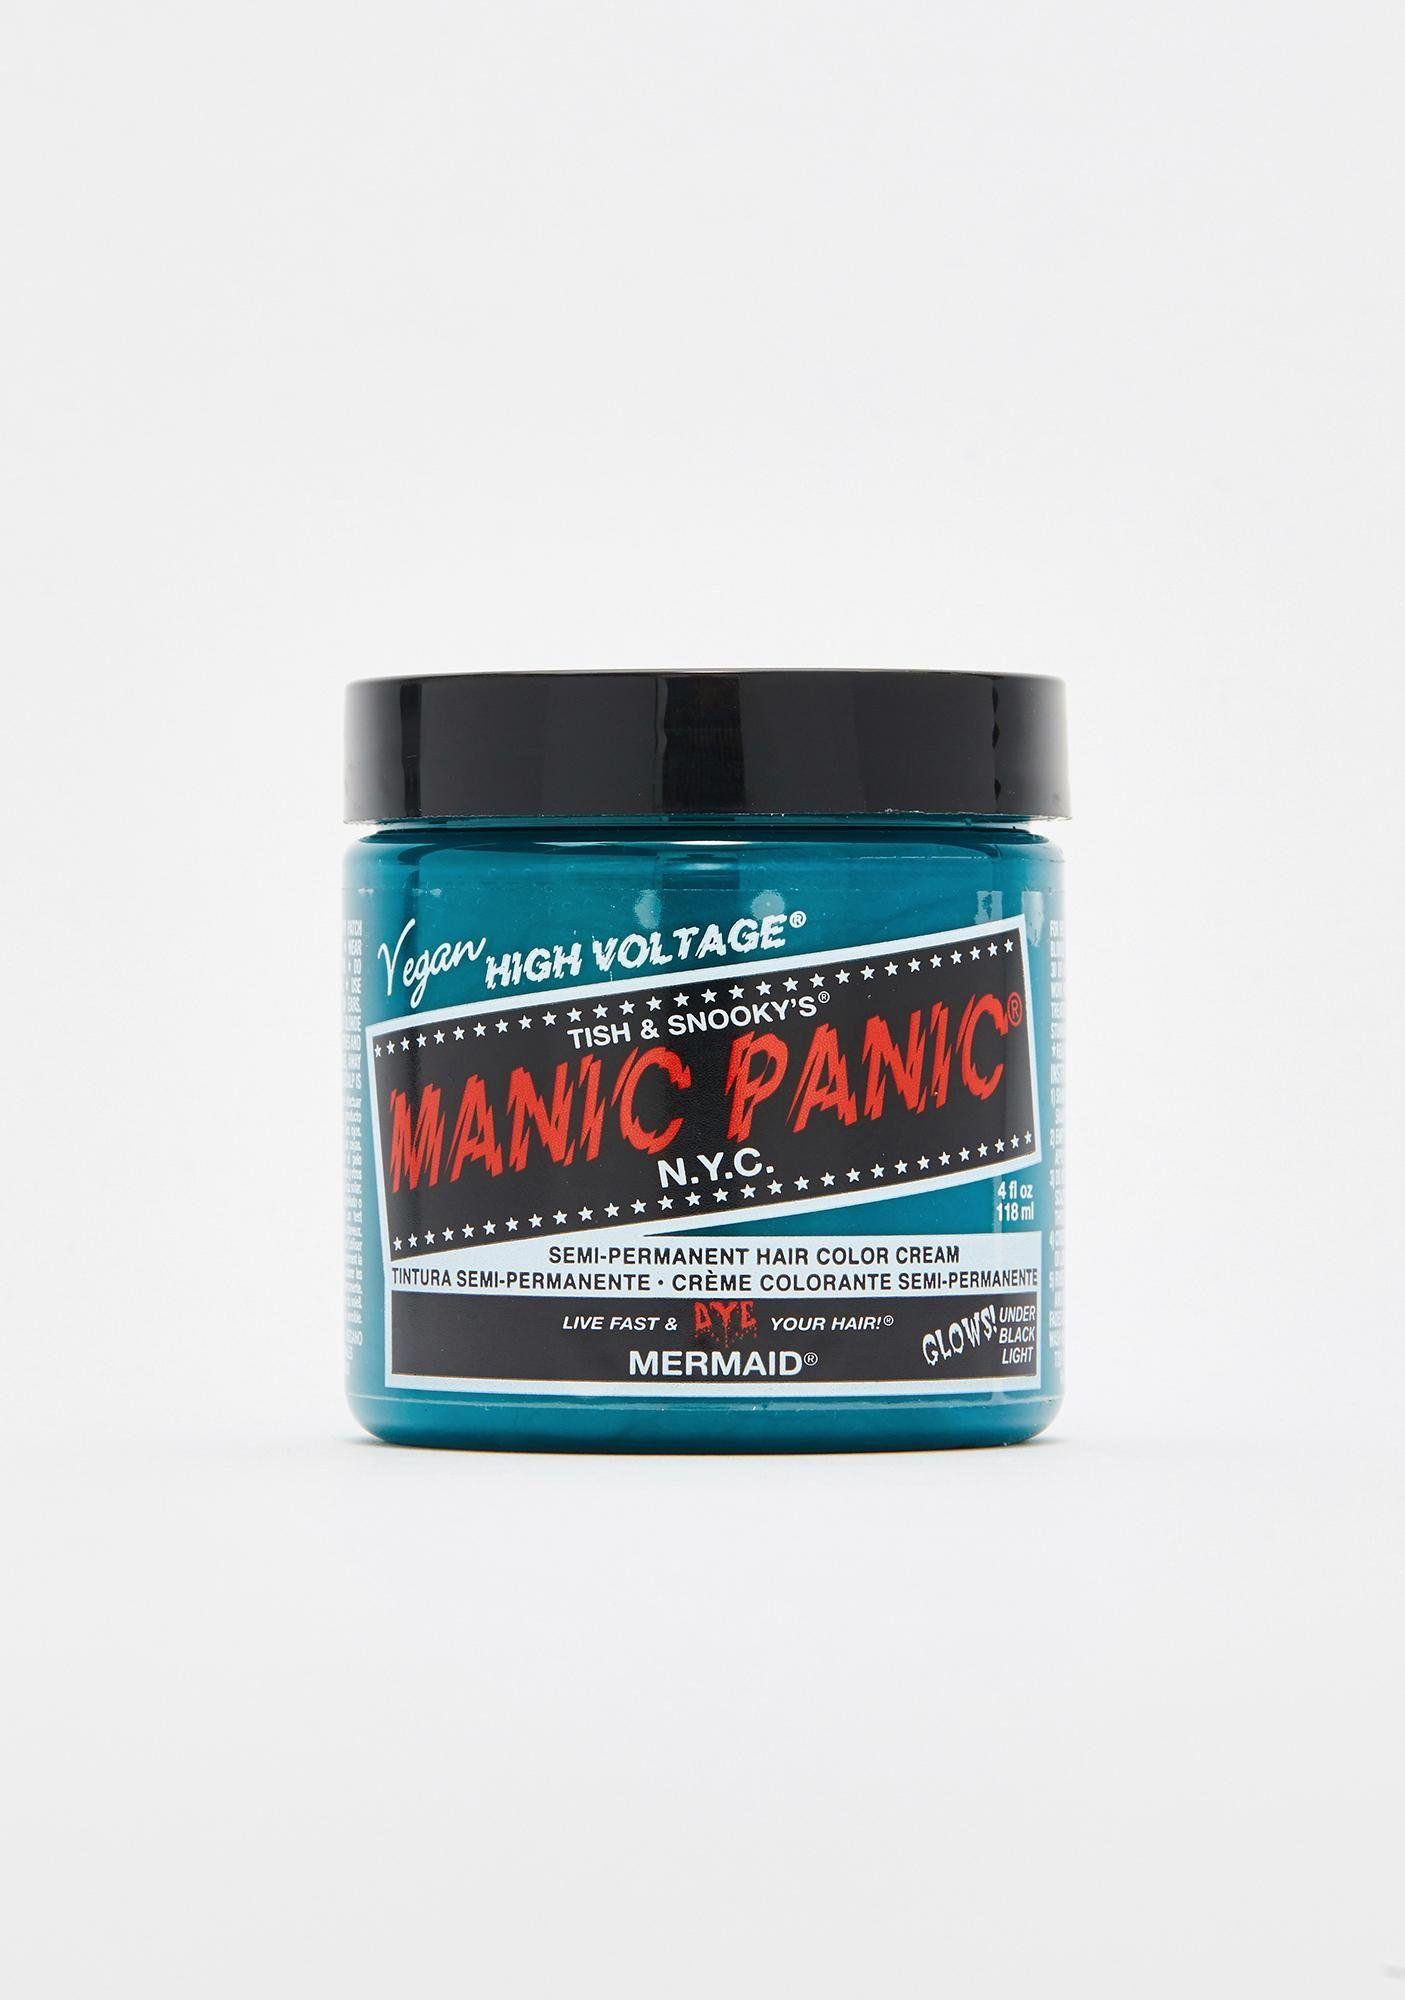 Manic Panic Siren's Song High Voltage Hair Dye | Dolls Kill |Mermaid Manic Panic High Voltage